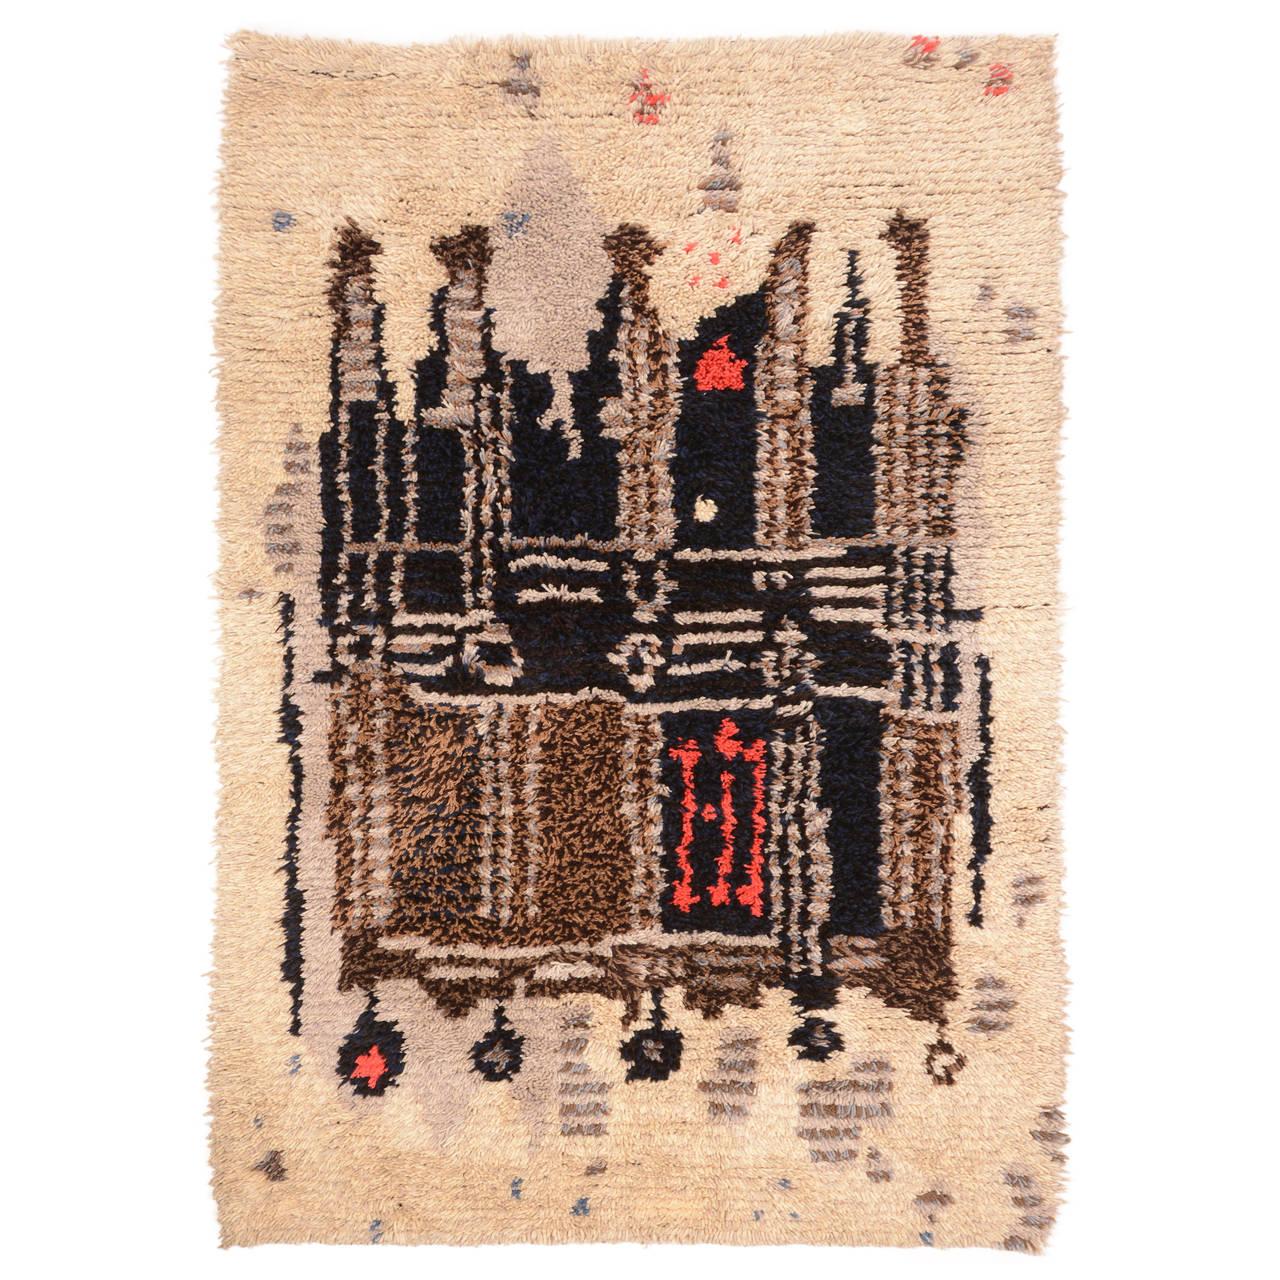 Midcentury Scandinavian Modern Rya Wool Rug Wall Hanging For